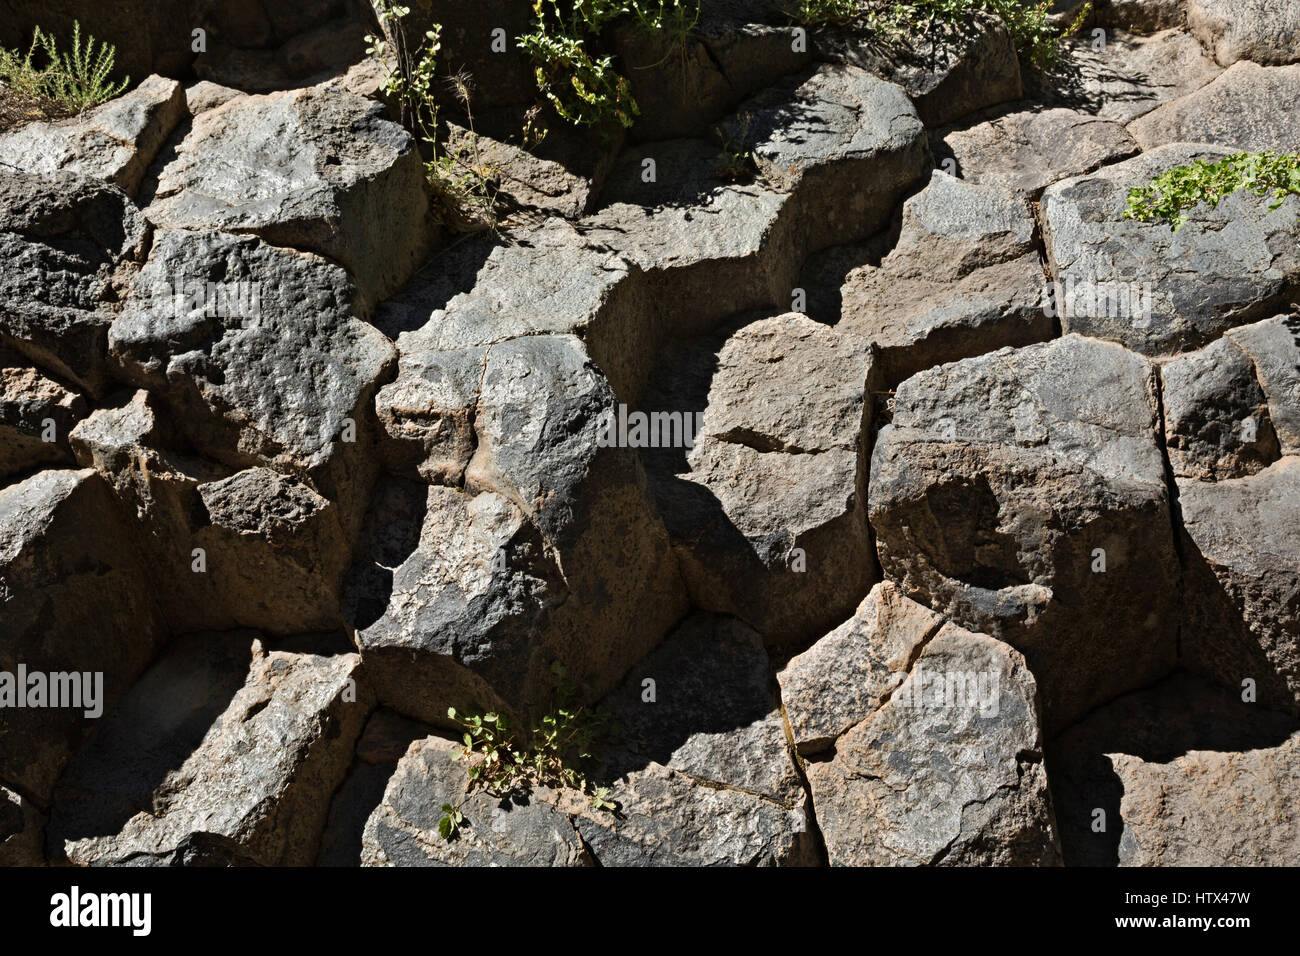 CA03043-00...CALIFORNIA - Hexagonal heads of columnar basalt in Devils Postpile National Monument. - Stock Image